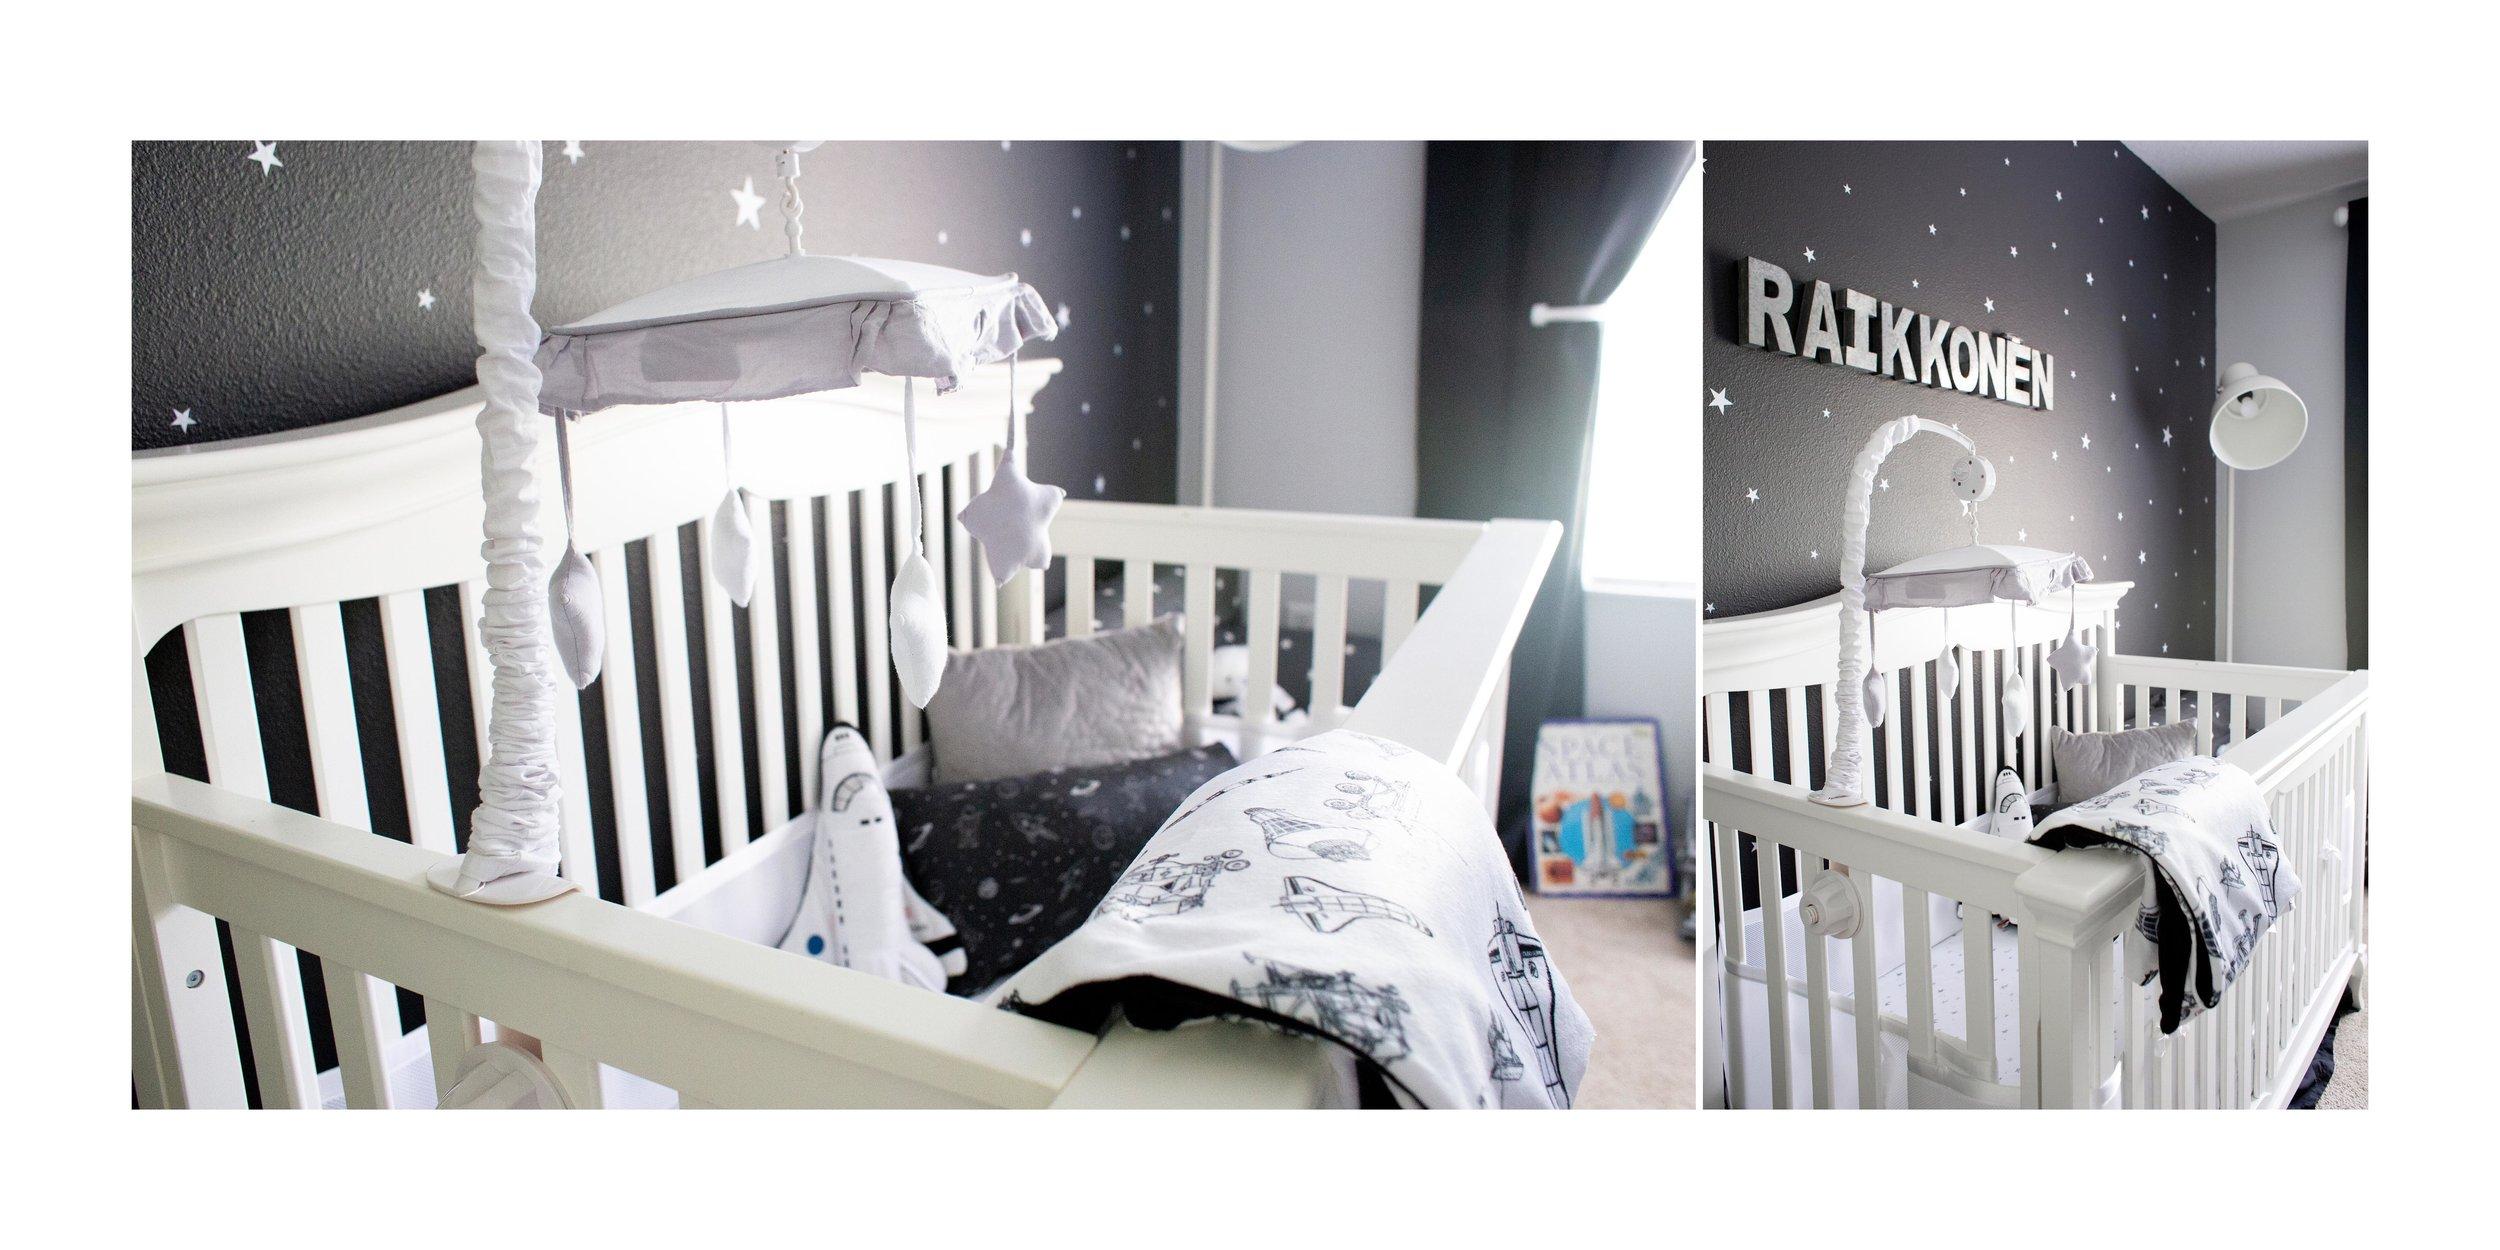 Raikkonen's_room_09.jpg